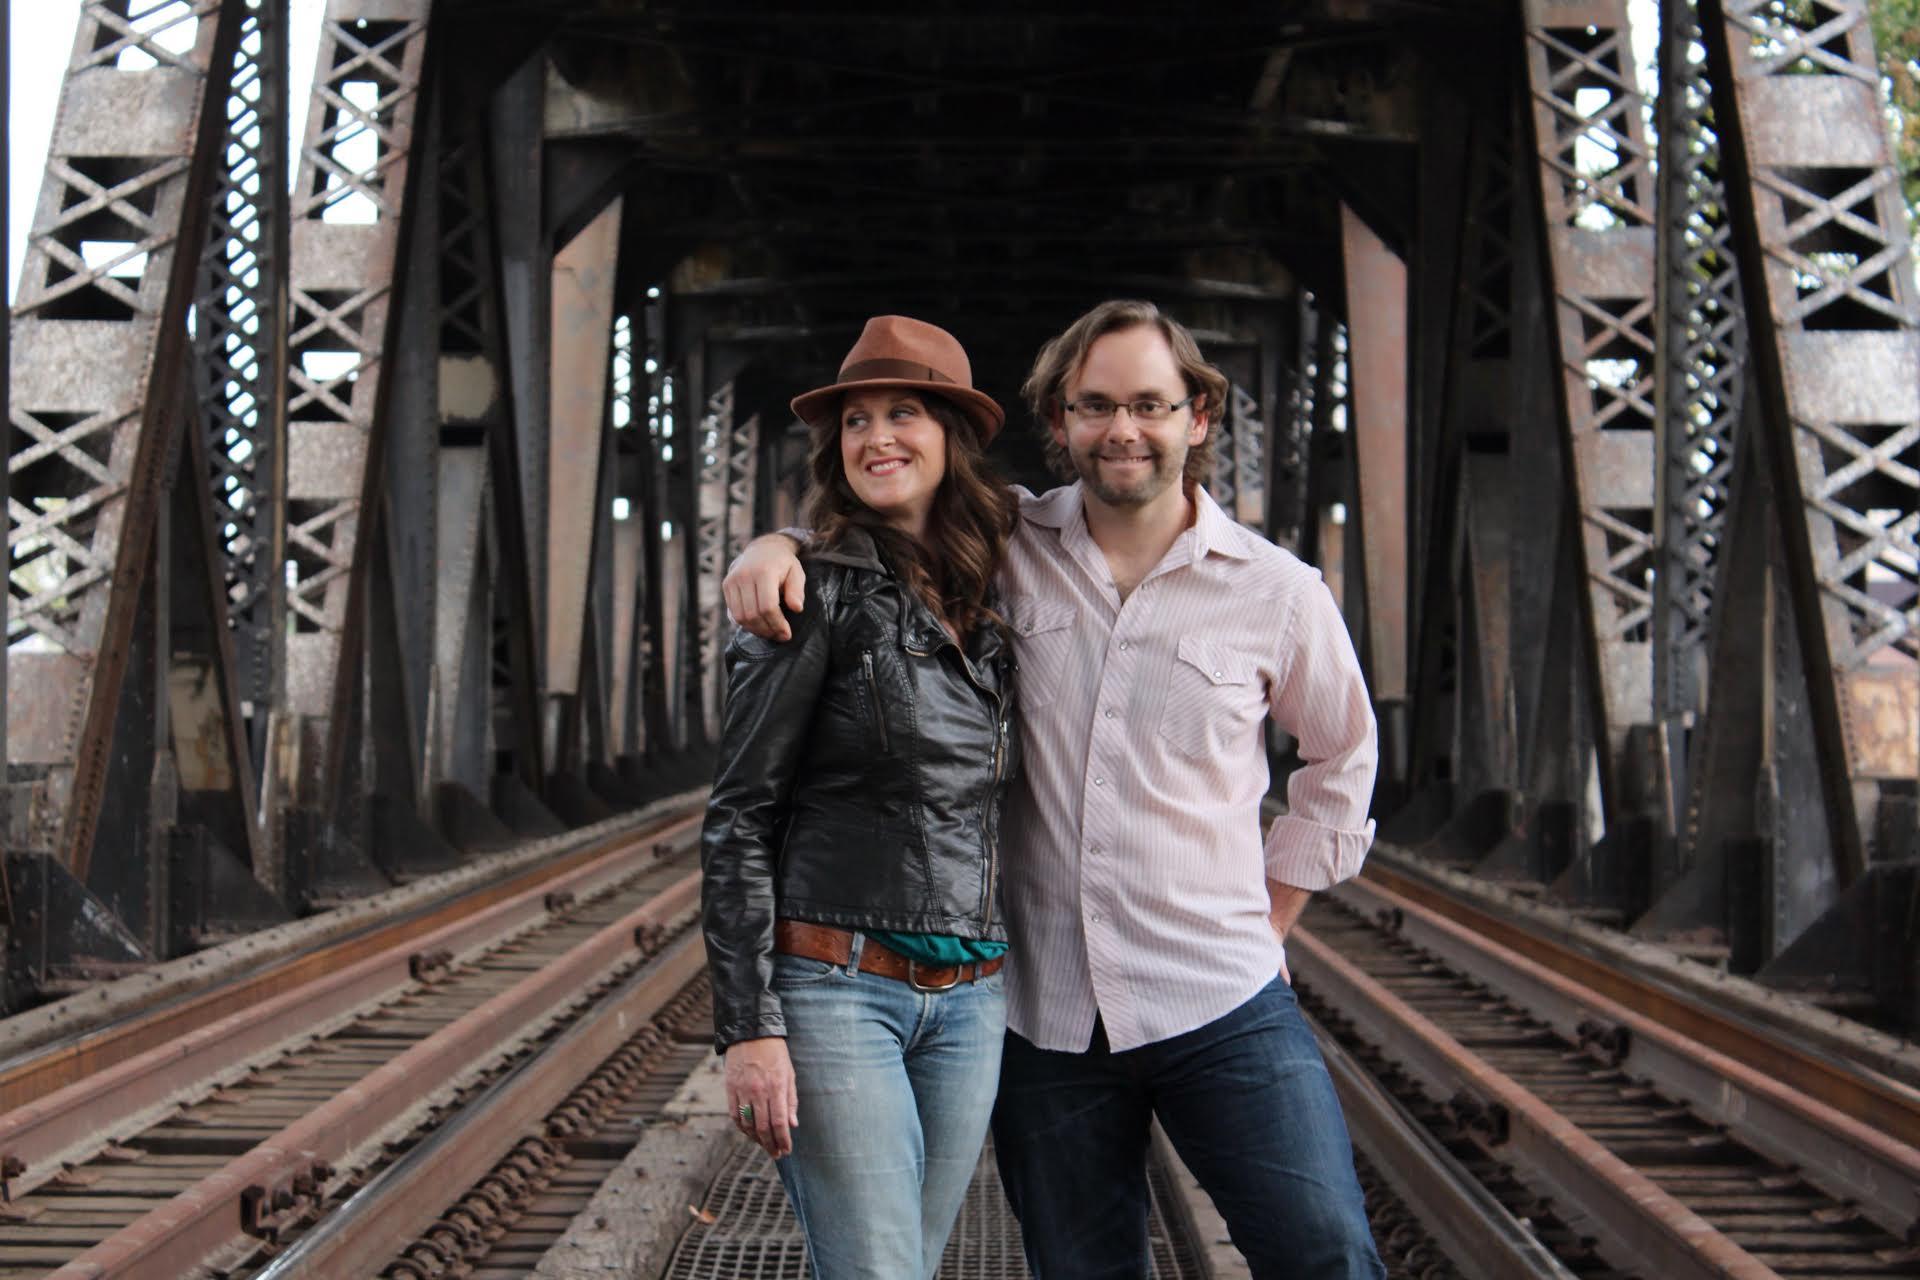 WATCH: Misner & Smith, 'Lovers Like Us'